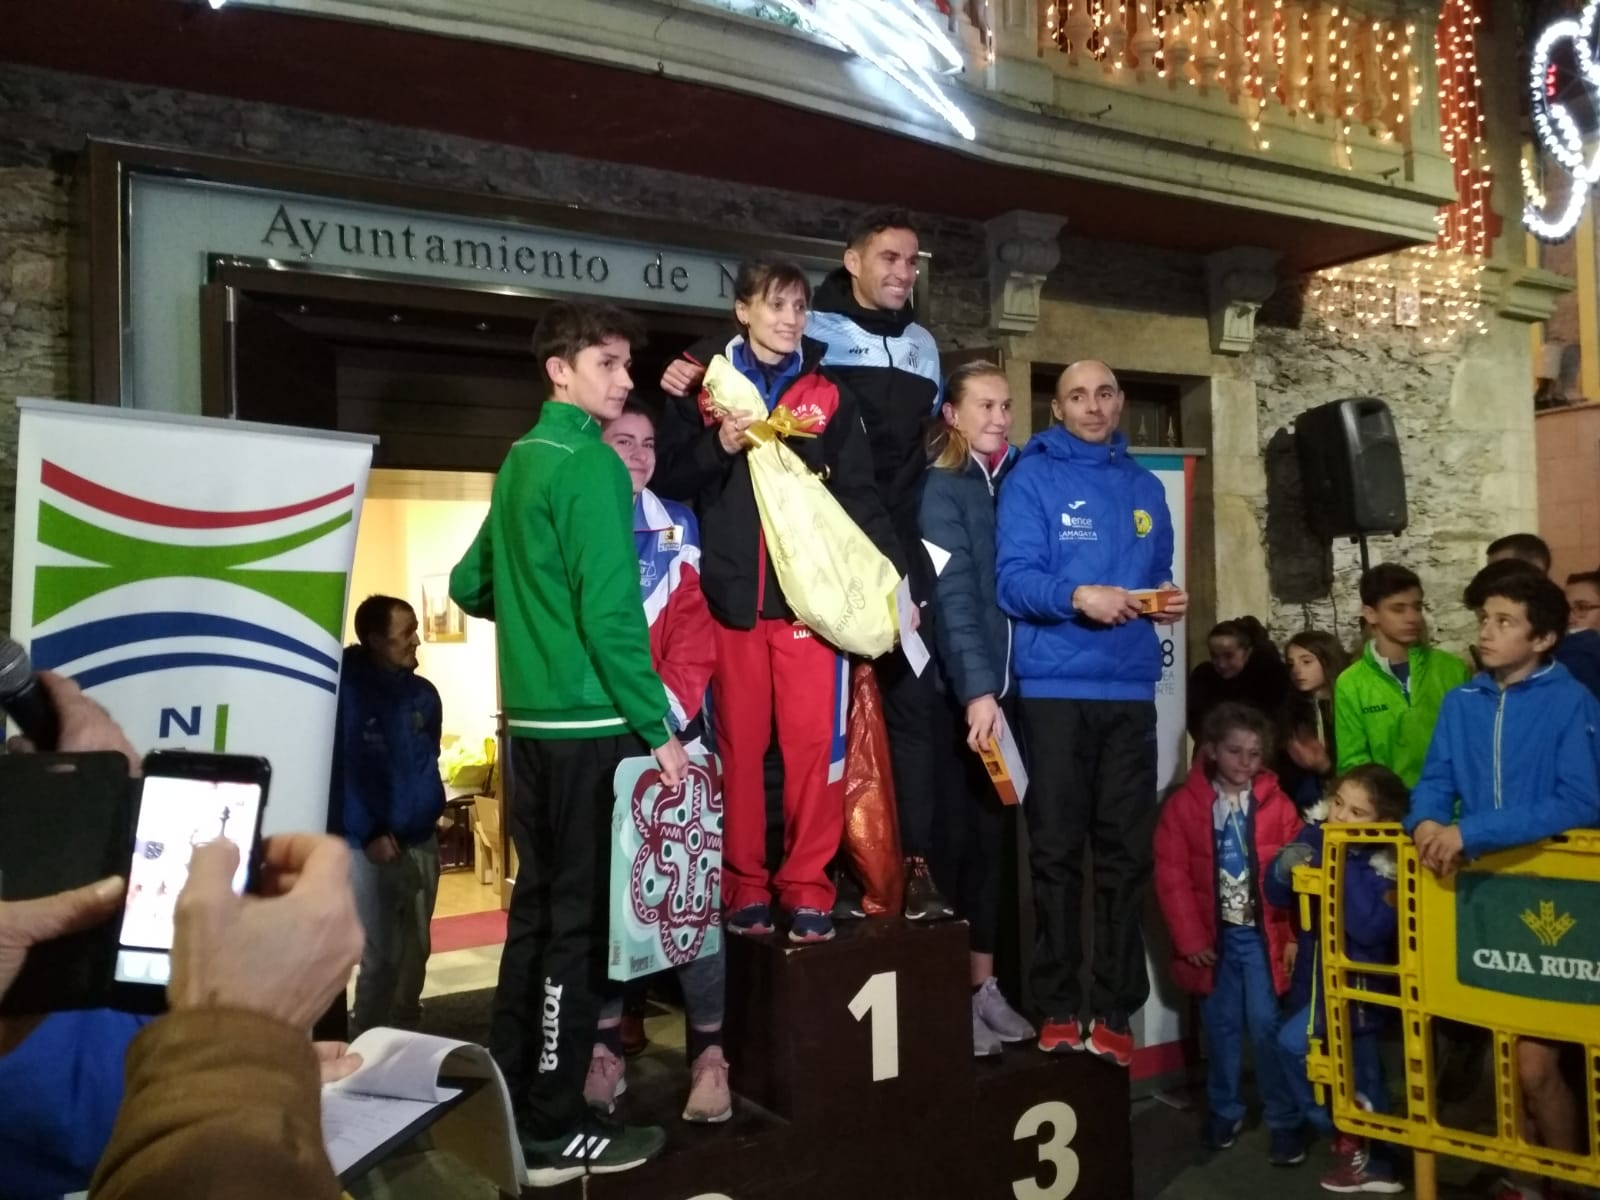 El malagueño Daniel Pérez y la praviana Leticia Prieto, Vencedores de la San Silvestre de Navia